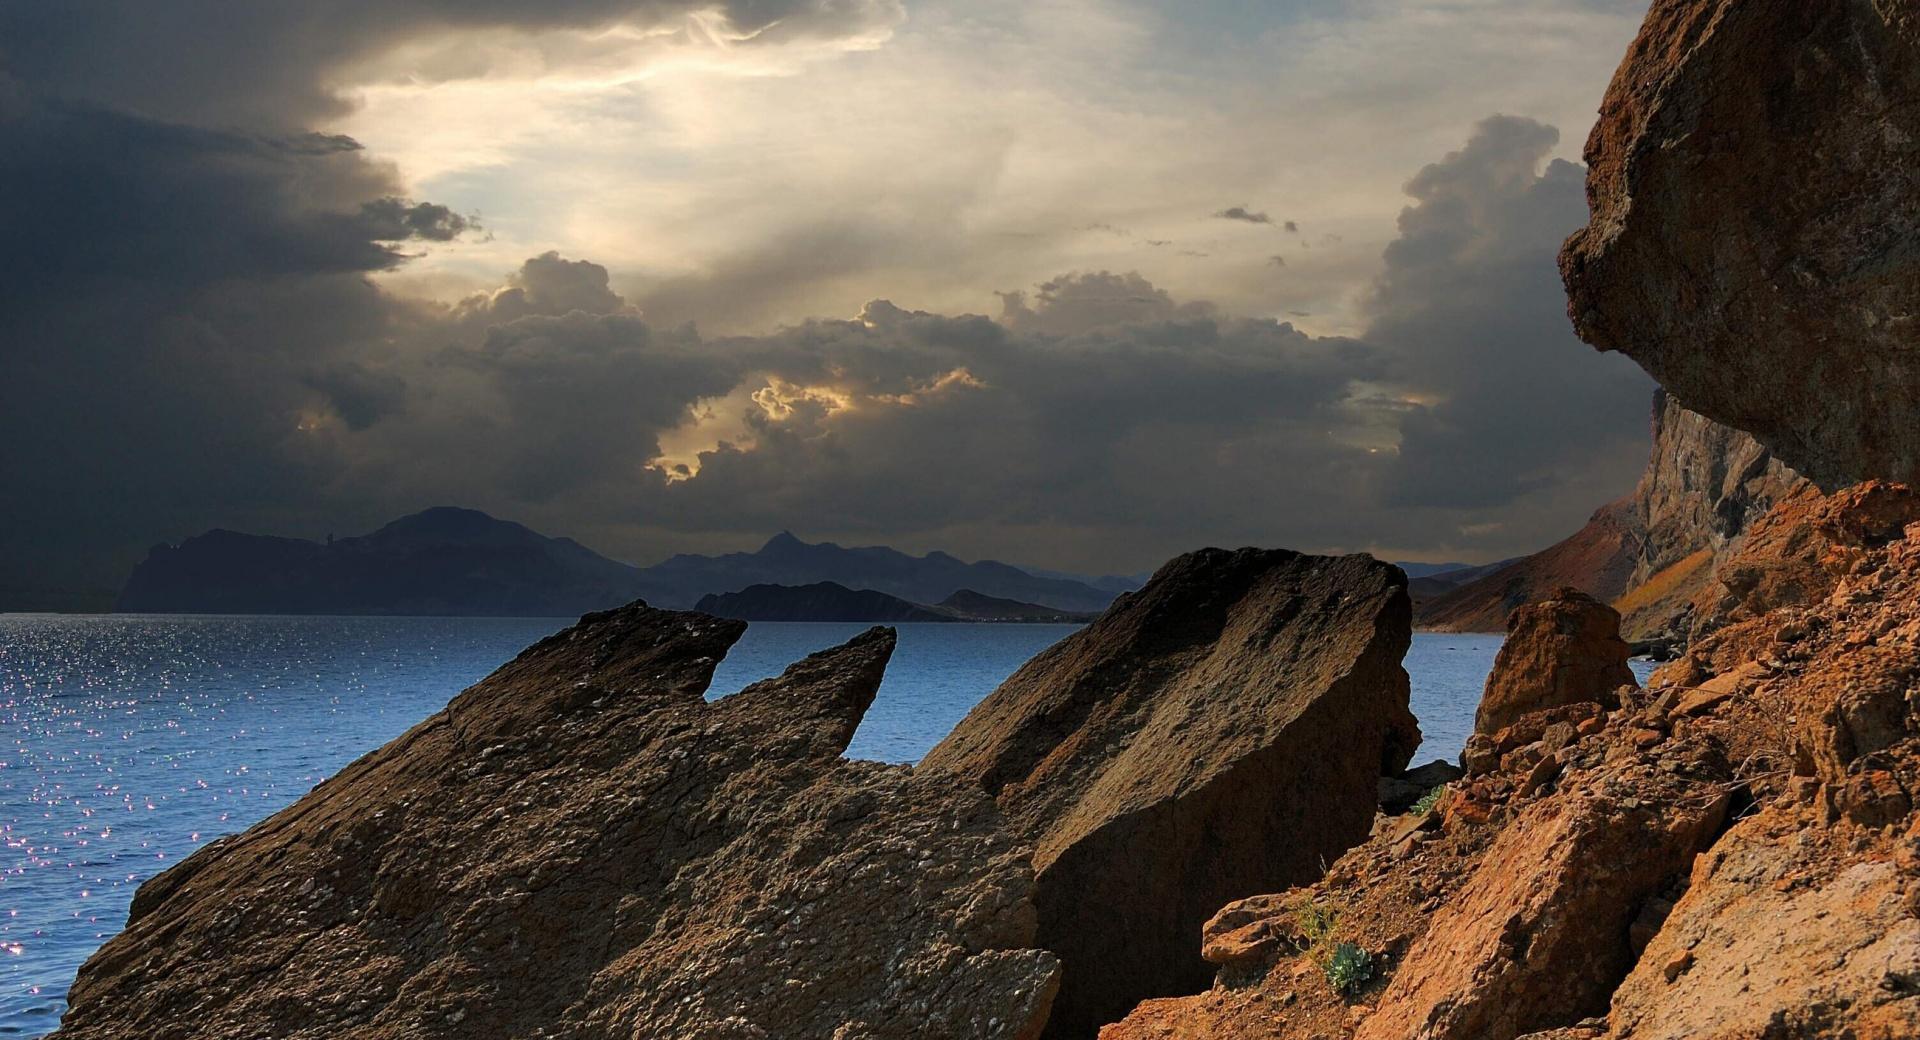 Arid Rocks wallpapers HD quality